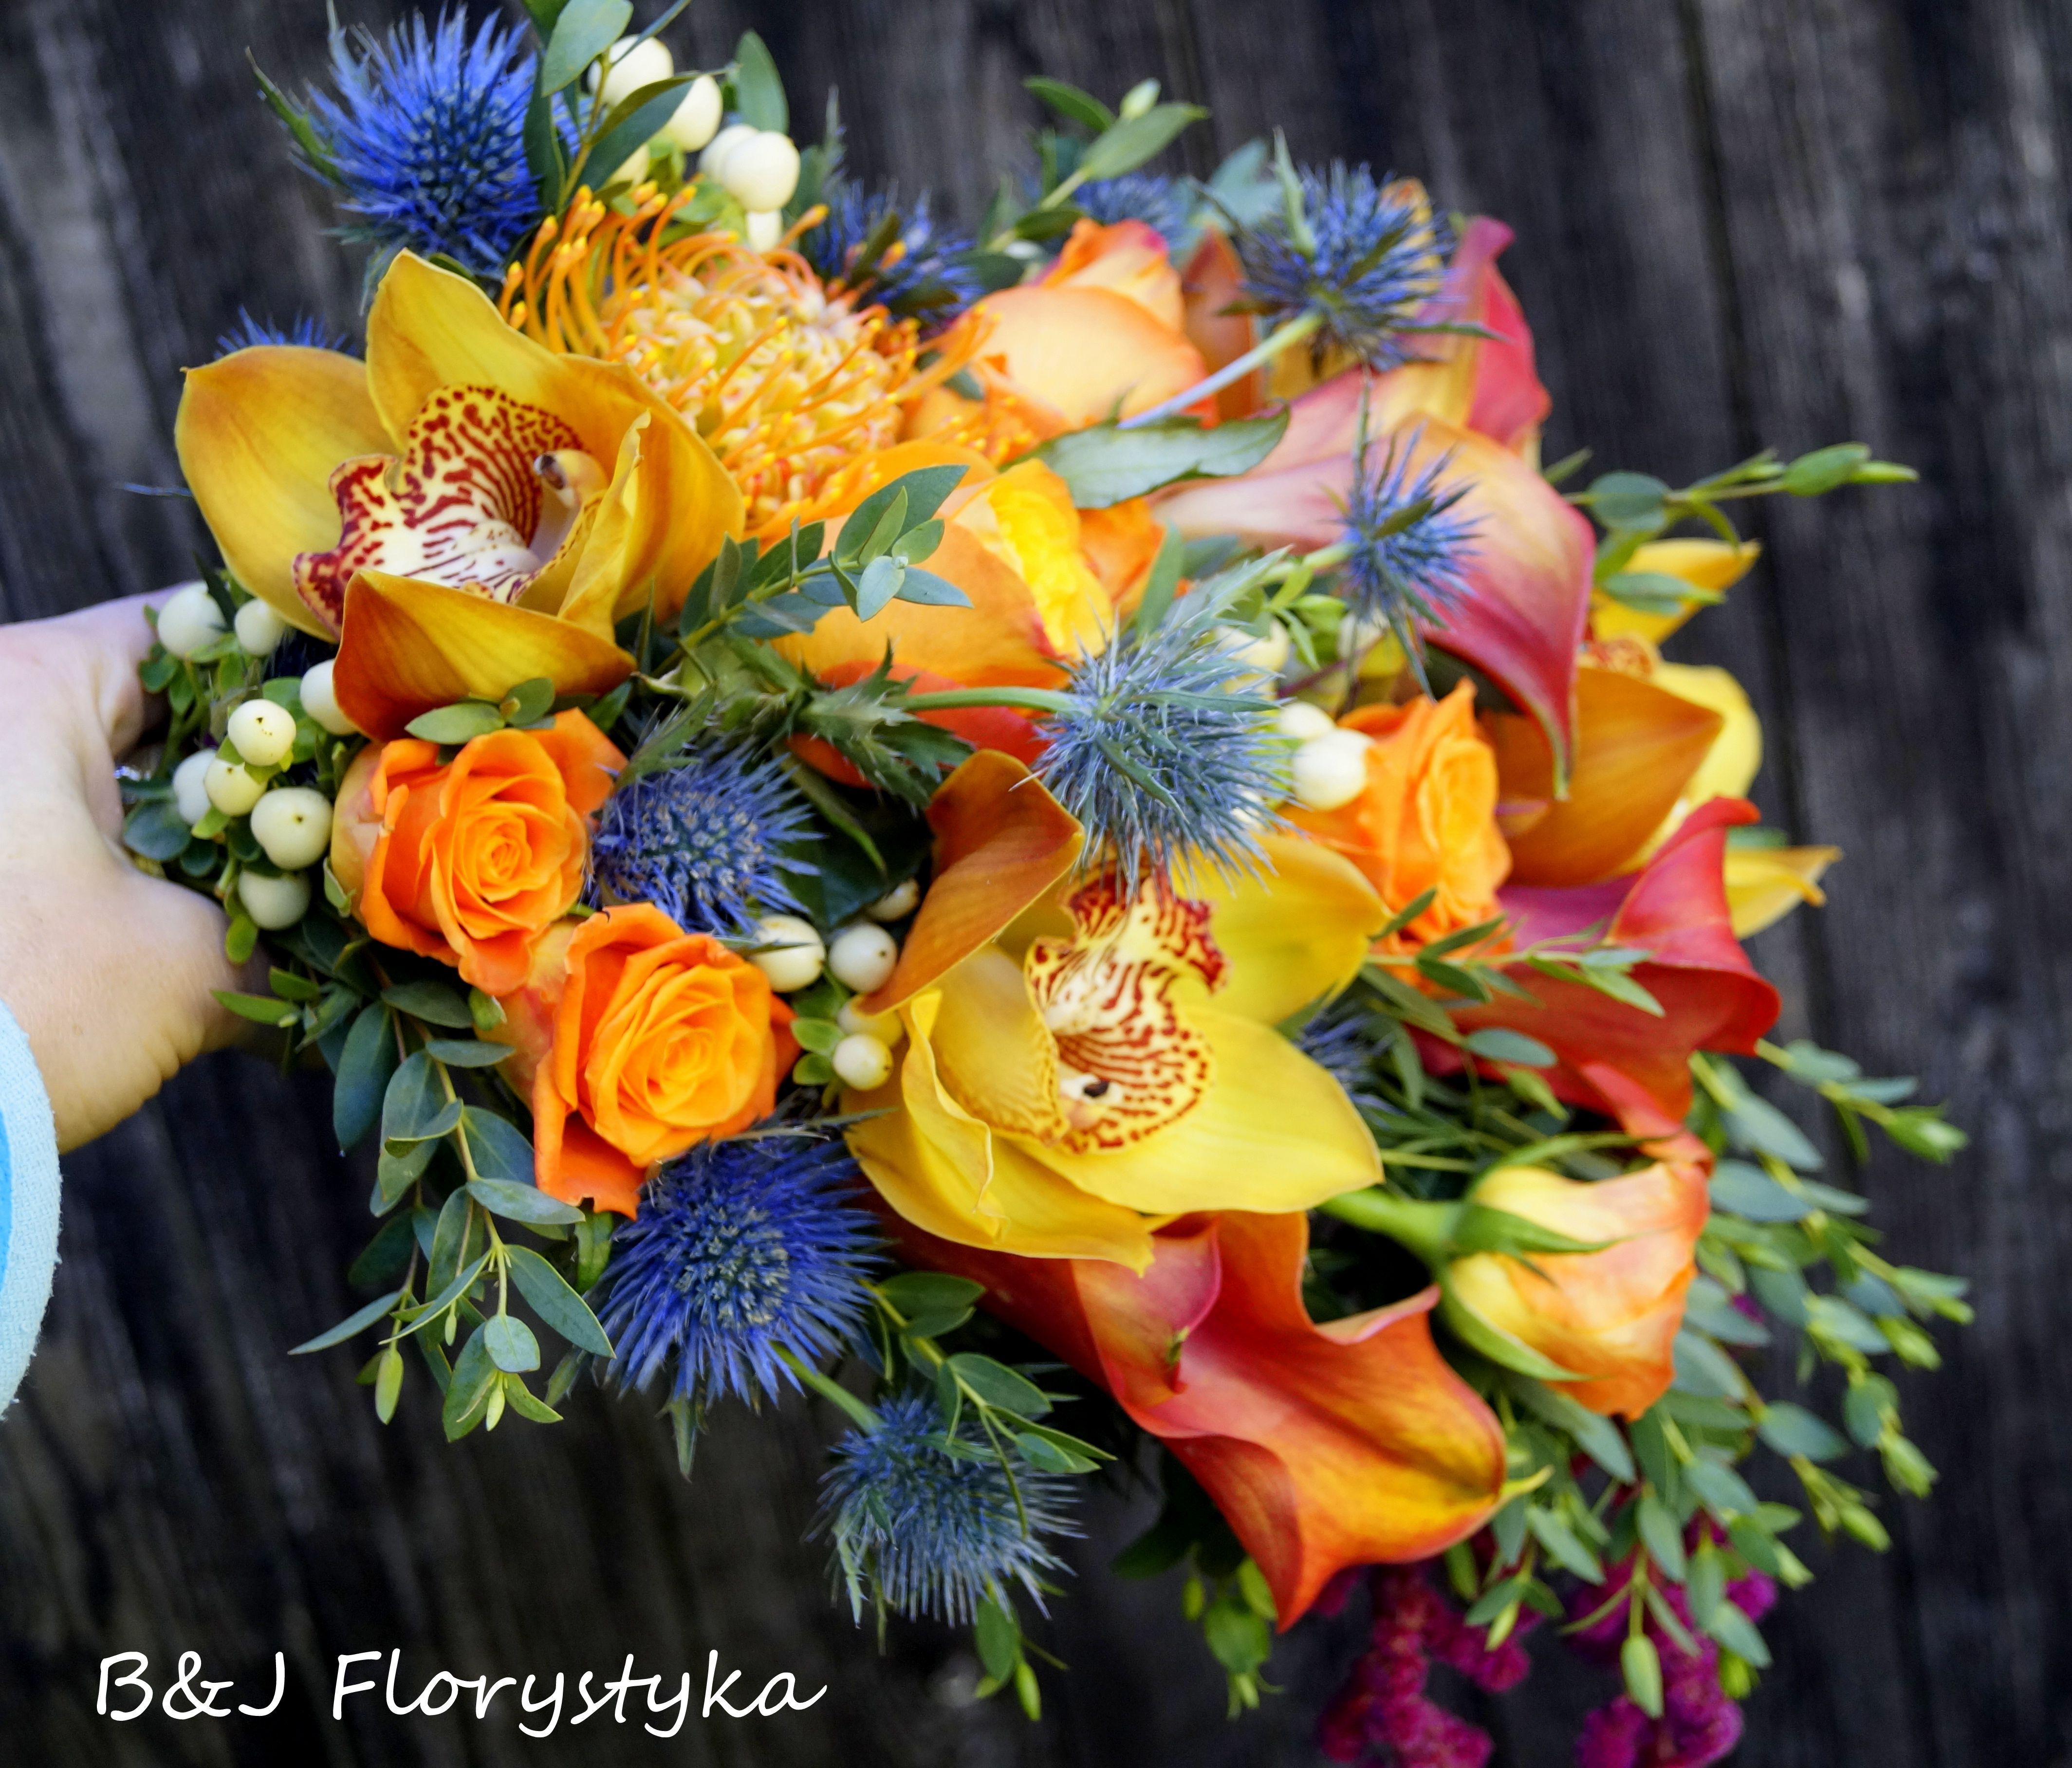 Bukiet Slubny Z Cymbidium Floral Wreath Floral Wreaths